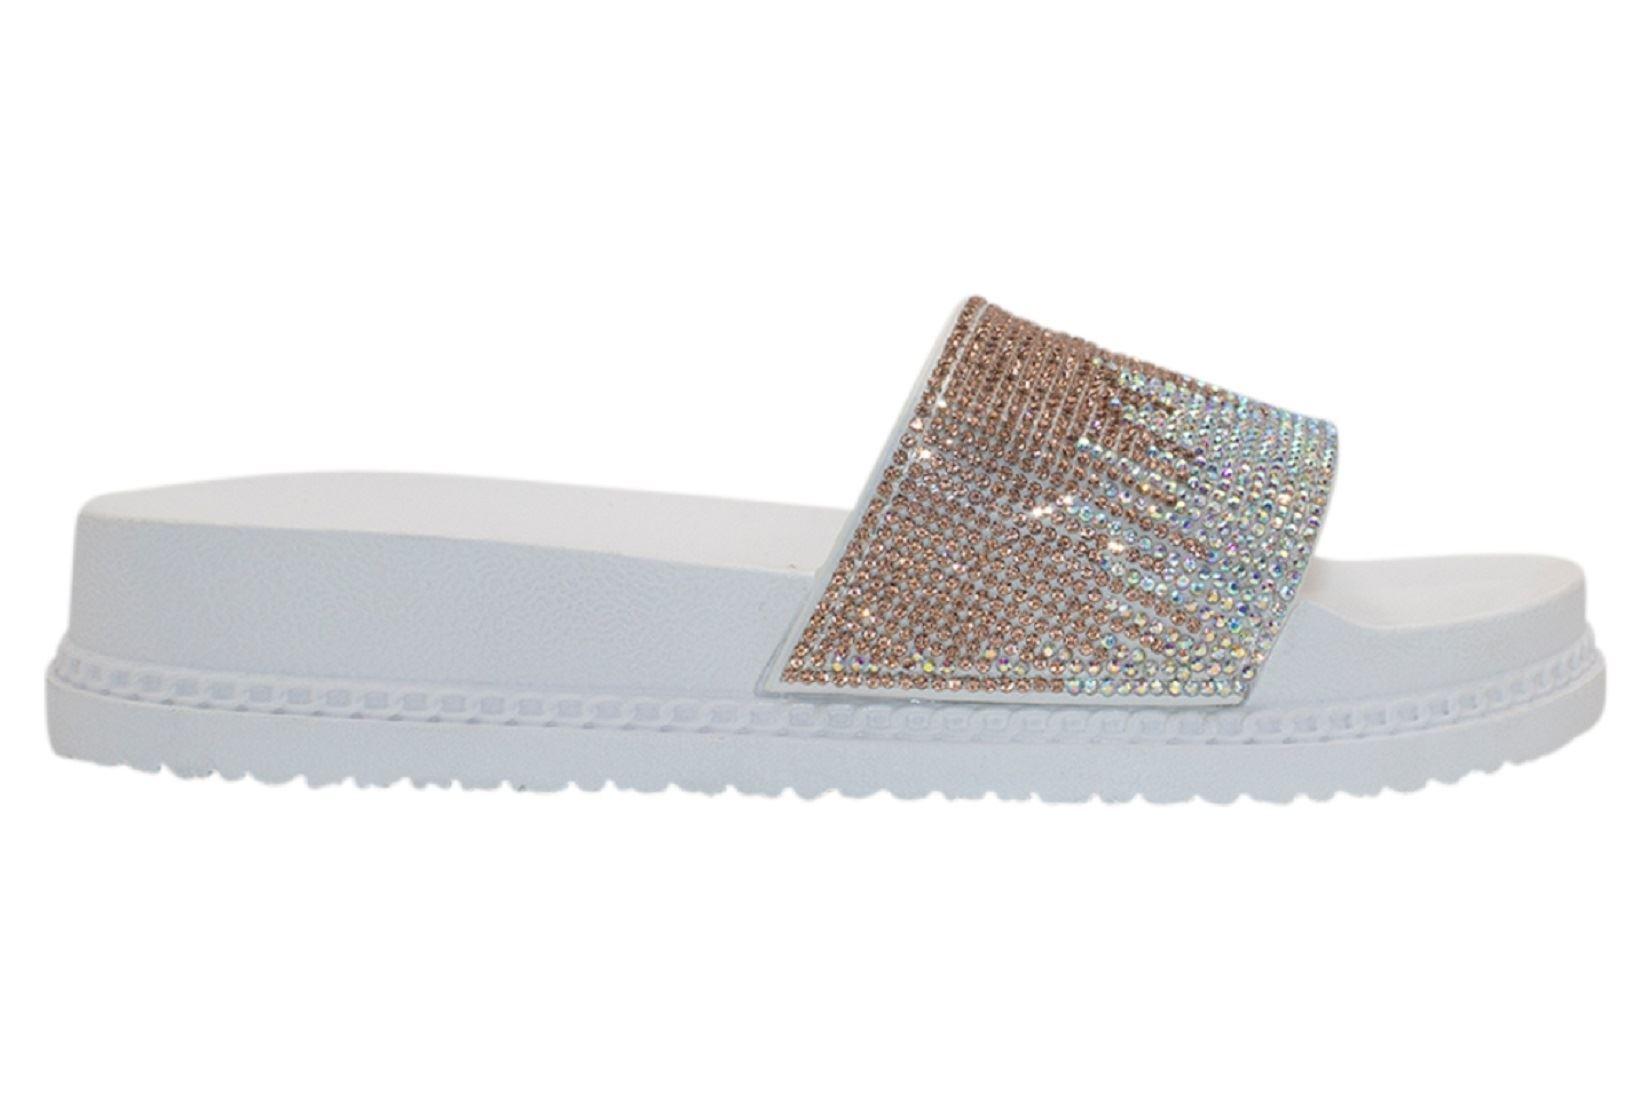 Womens-Sliders-Casual-Slippers-Mules-Ladies-Diamante-Flip-Flop-Sandals-Shoes thumbnail 97